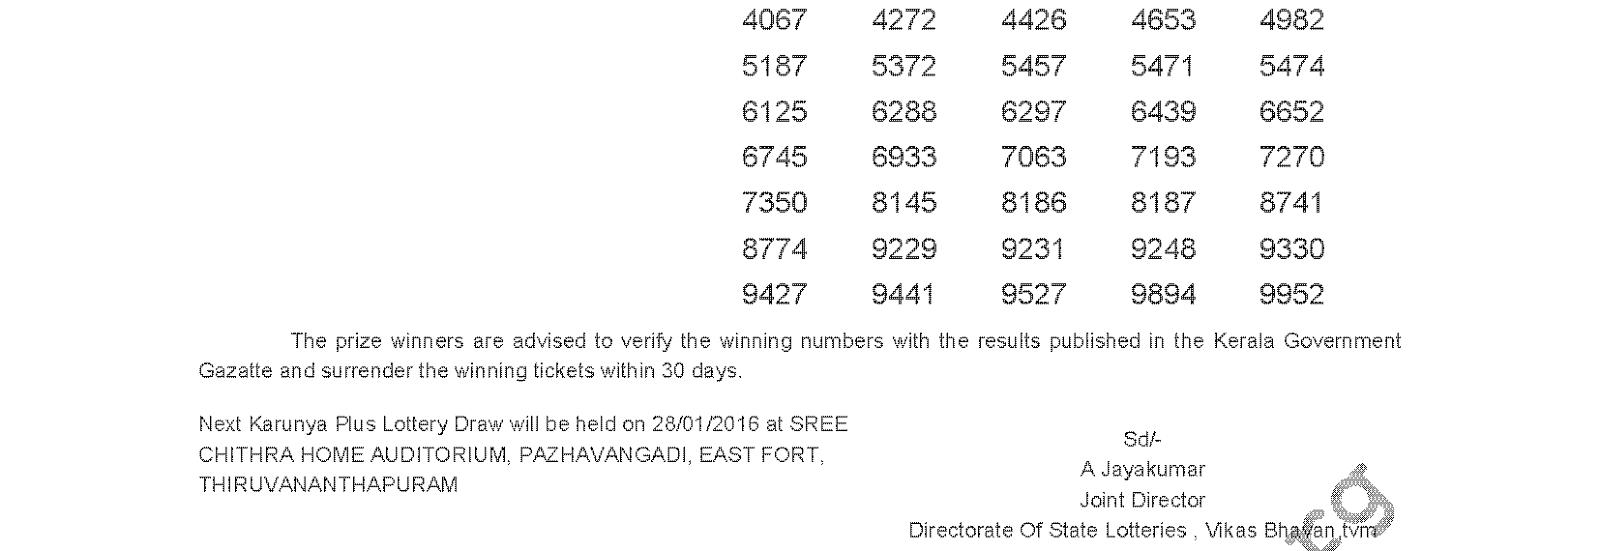 KARUNYA PLUS Lottery KN 93 Result 21-01-2016